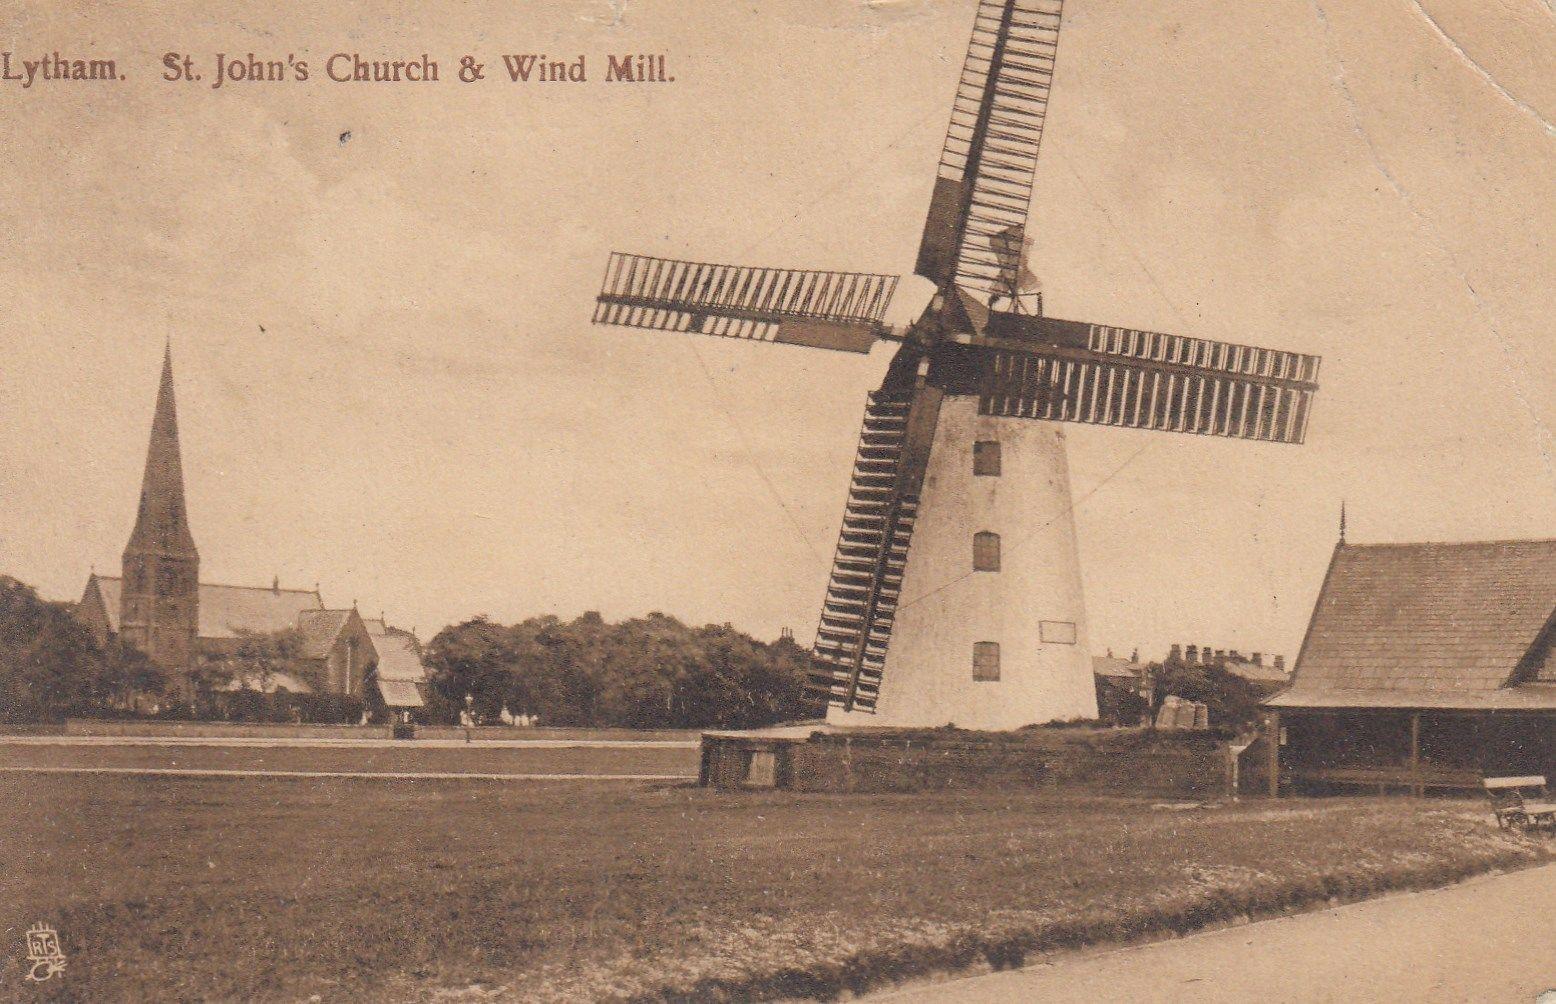 LYTHAM - ST JOHN'S CHURCH AND WIND MILL BY TUCKS 1909   eBay